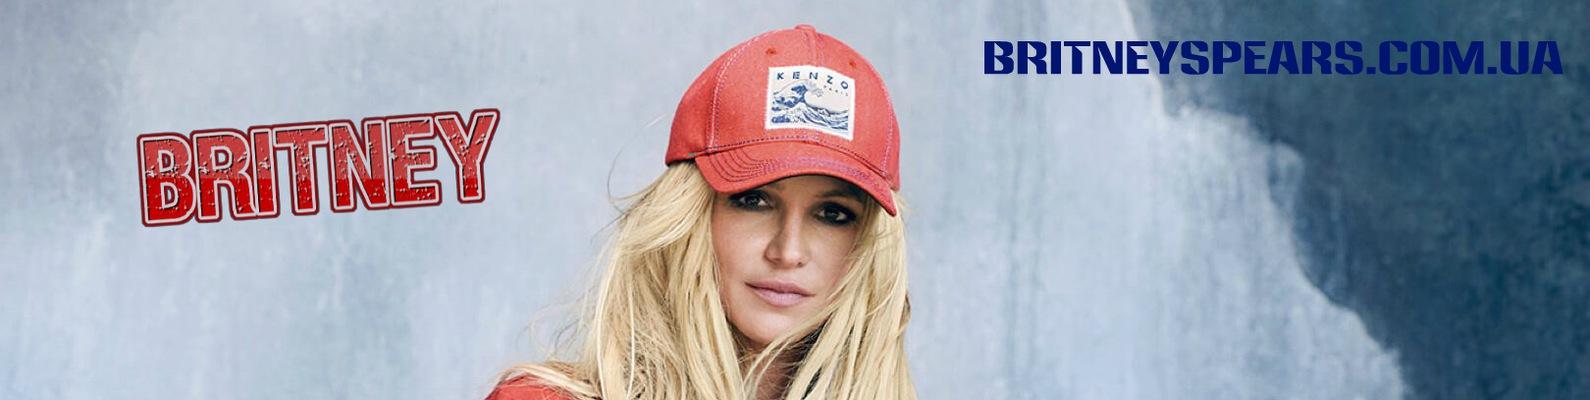 БРИТНИ СПИРС / Britney Spears NEWS | VK бритни спирс вк